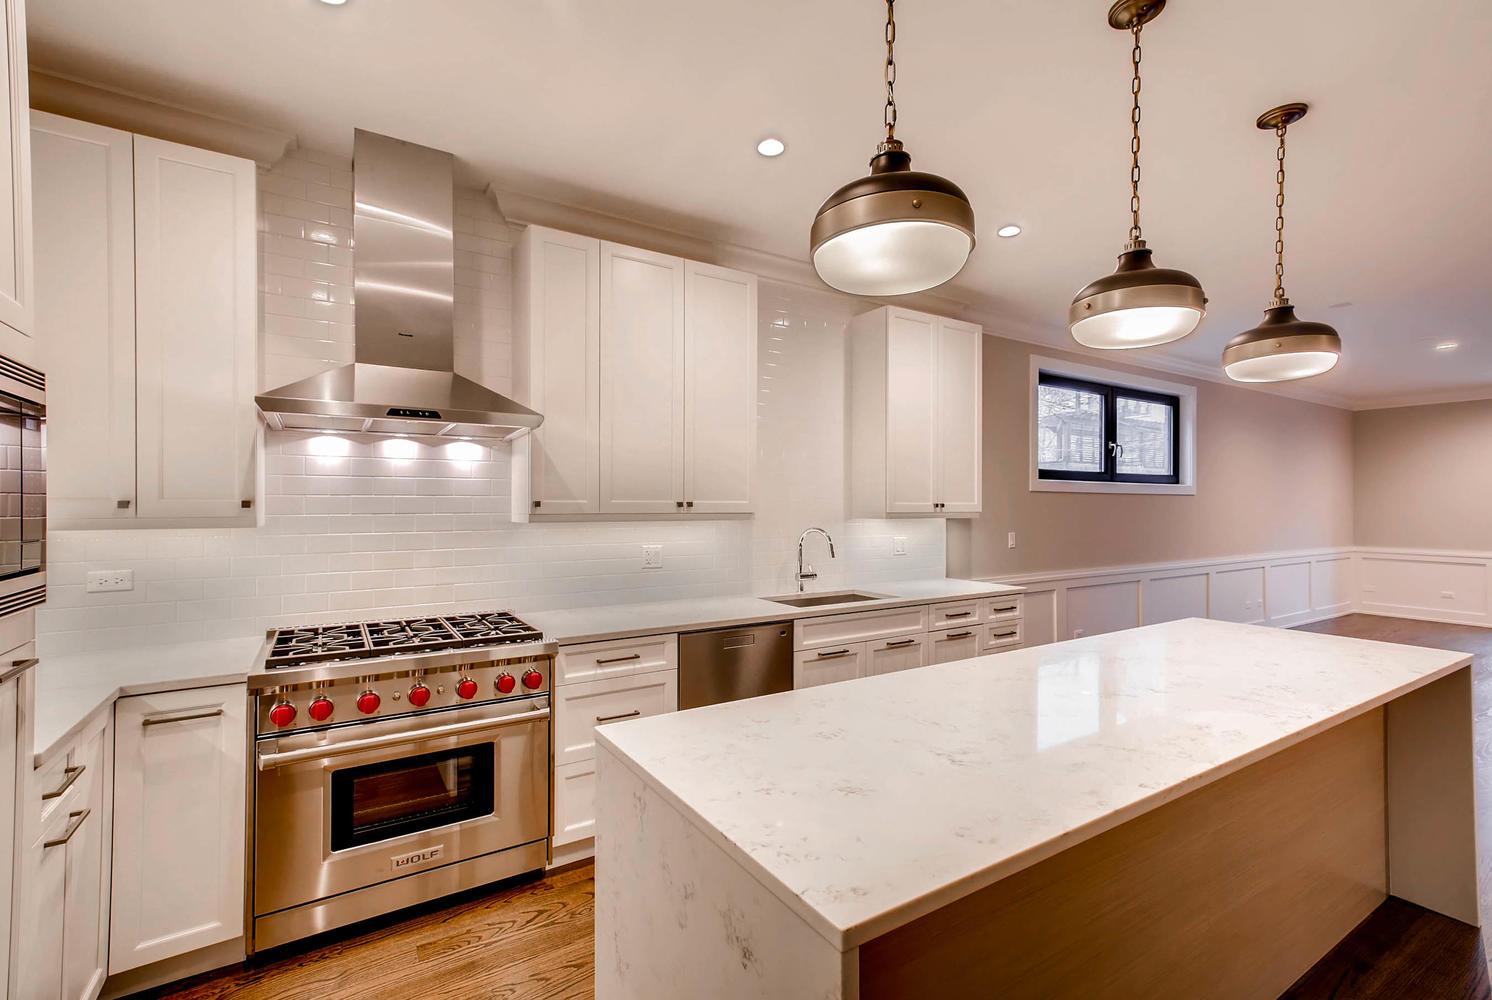 877 N HERMITAGE AVE UNIT 1-large-005-9-Kitchen-1492x1000-72dpi.jpg